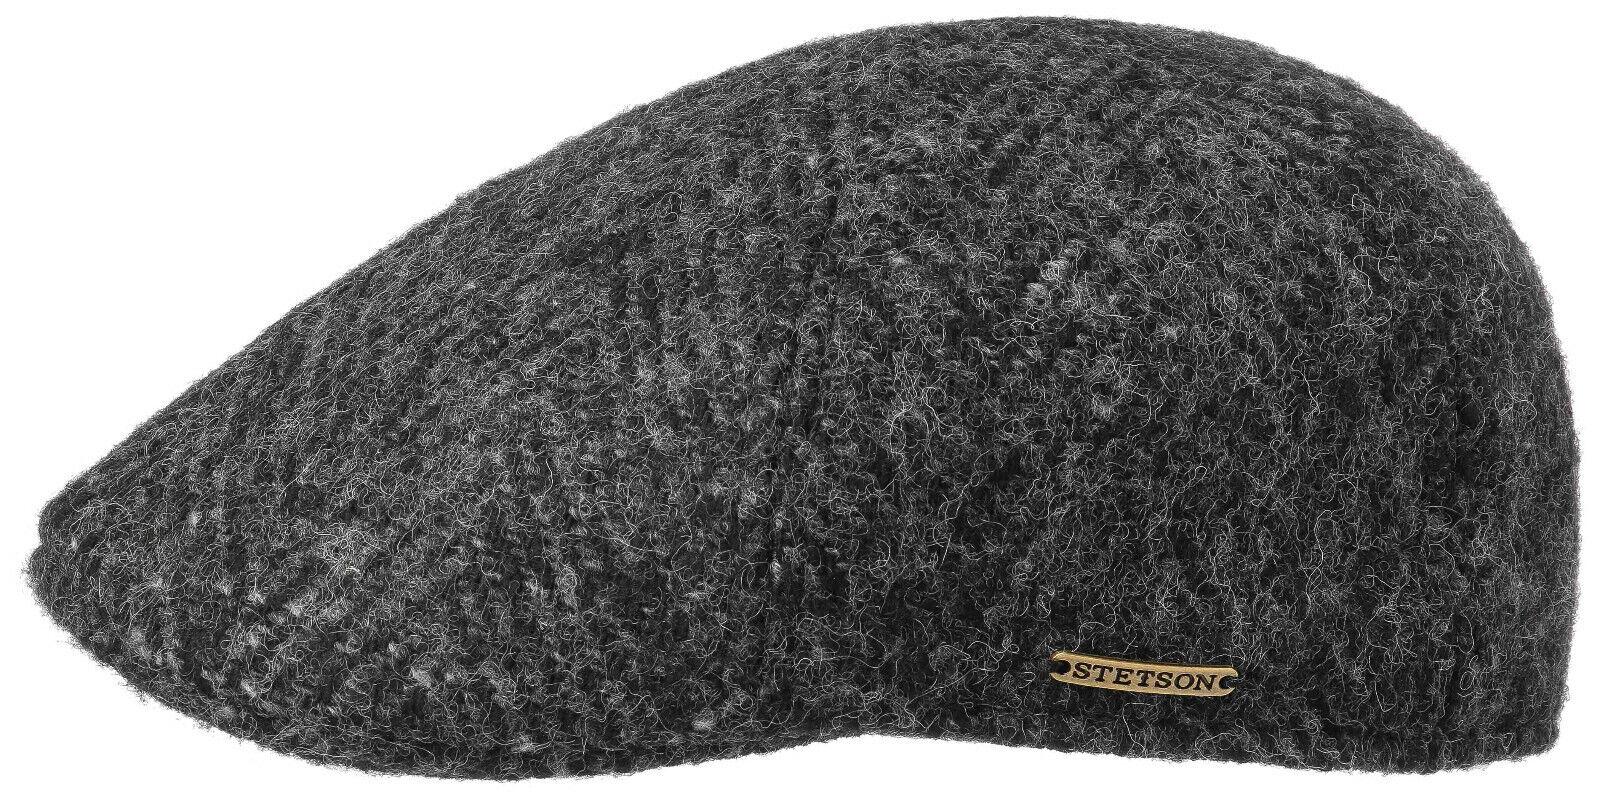 Stetson Duck cap gorra sombrero texas herringbone lana virgen 331 negro nuevo tendencia